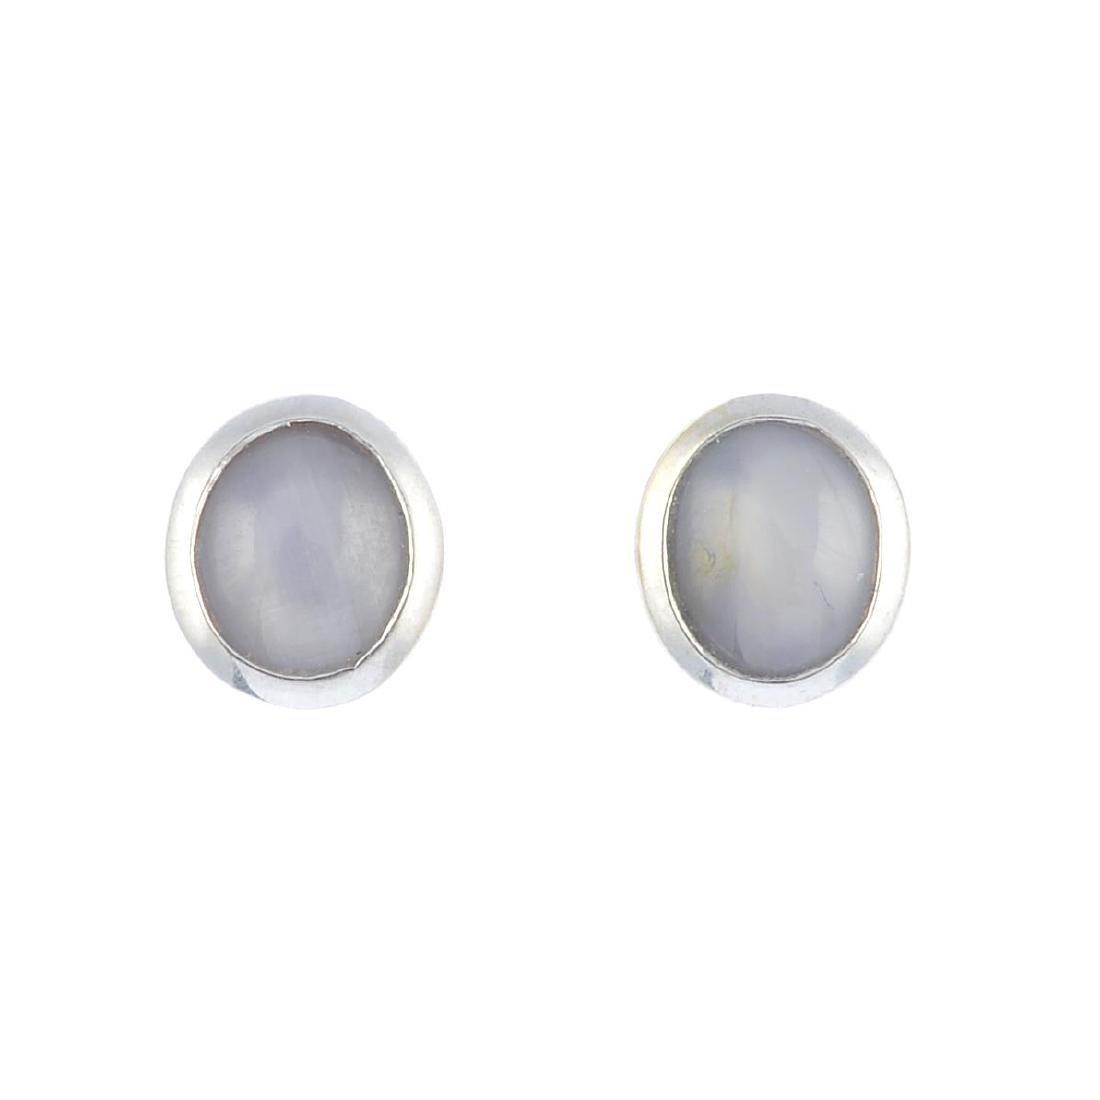 A pair of star sapphire stud earrings. Each designed as